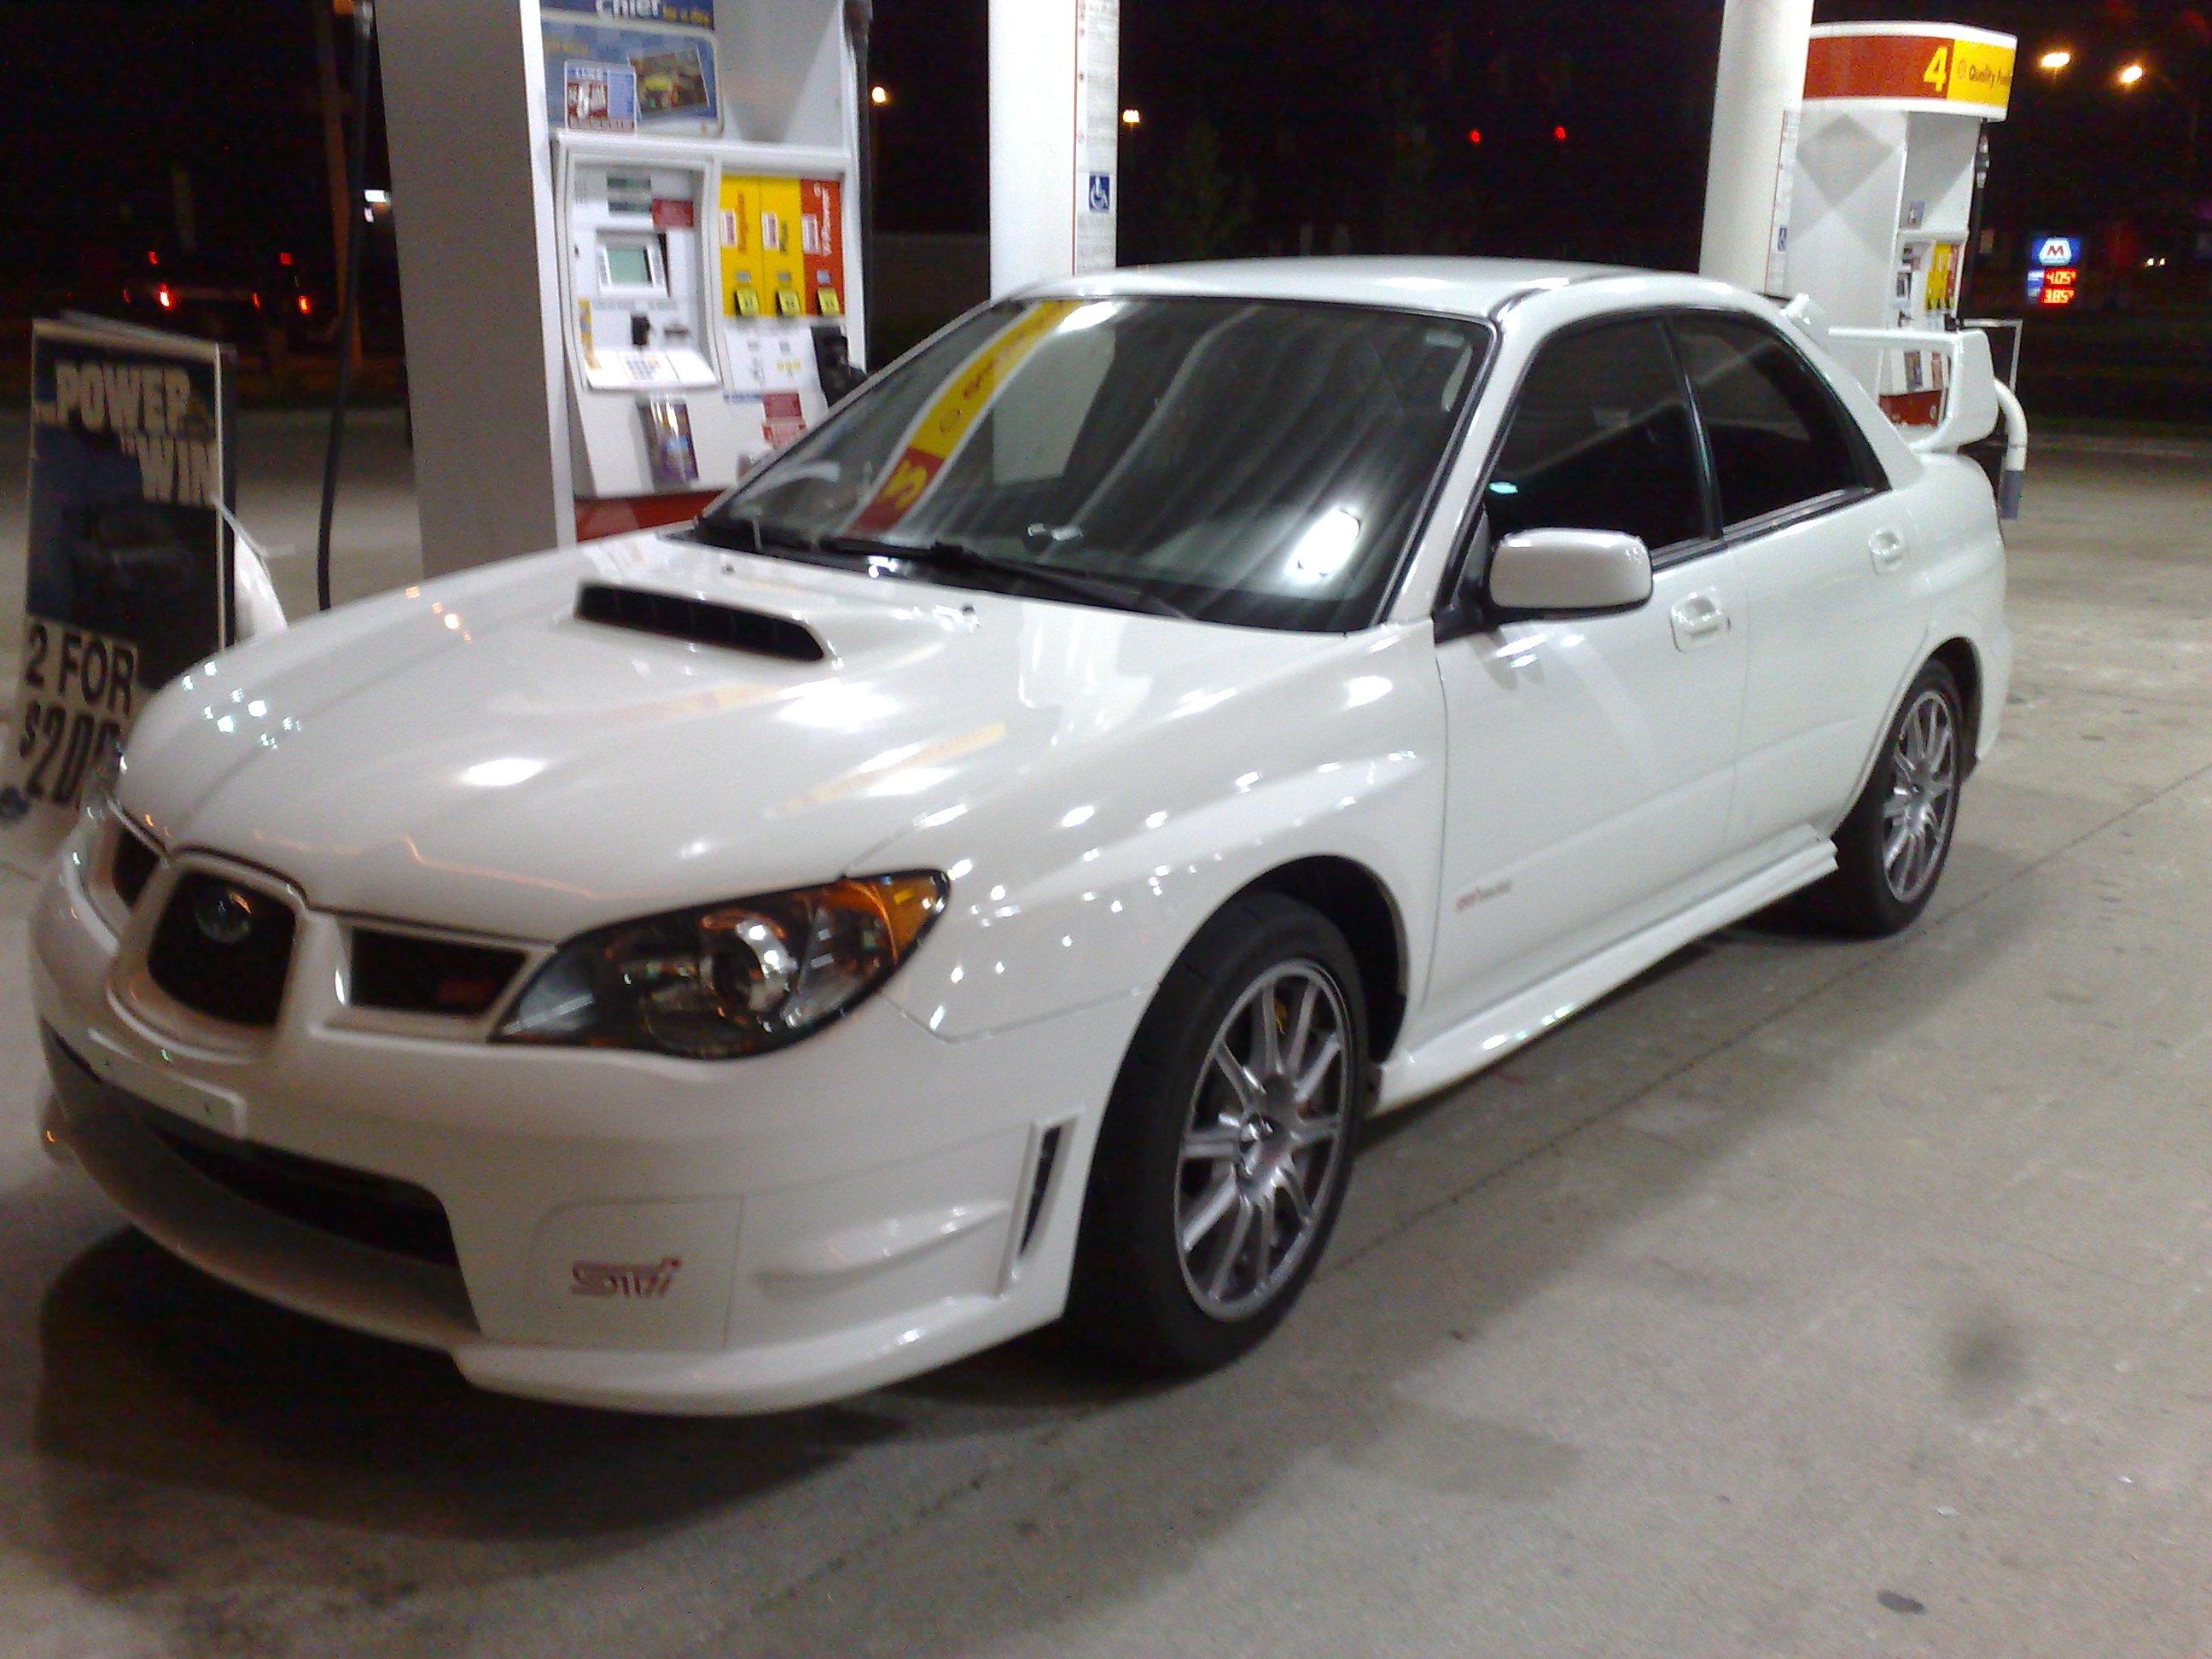 2006 Subaru Impreza WRX STi 1/4 mile Drag Racing timeslip specs 0-60 ...